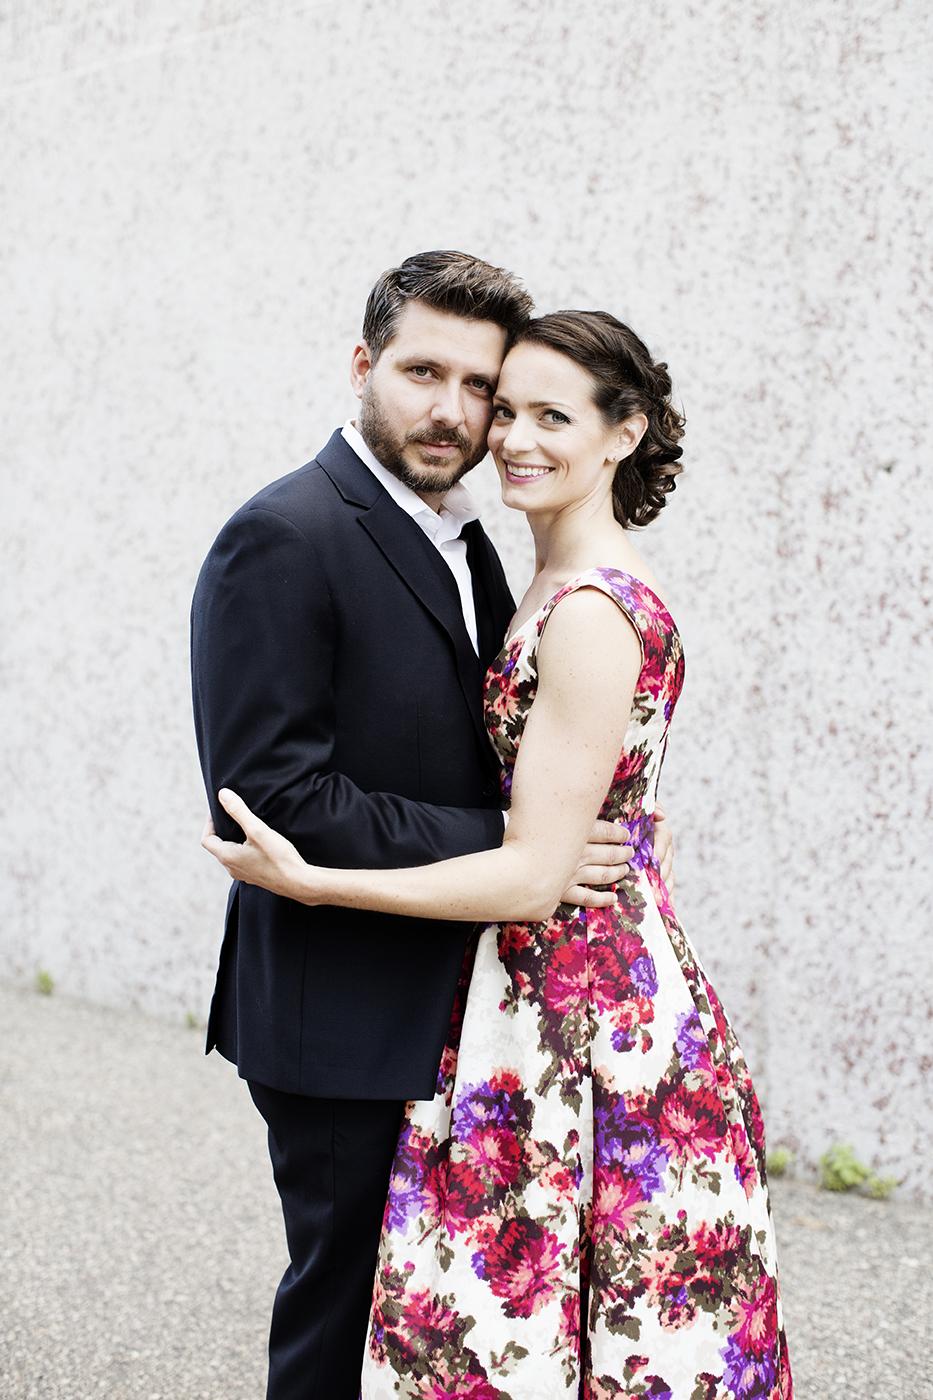 514 Studios Wedding | Minneapolis Wedding Photographer | Photos by Photogen Inc. | Eliesa Johnson | Based in Minneapolis, Minnesota